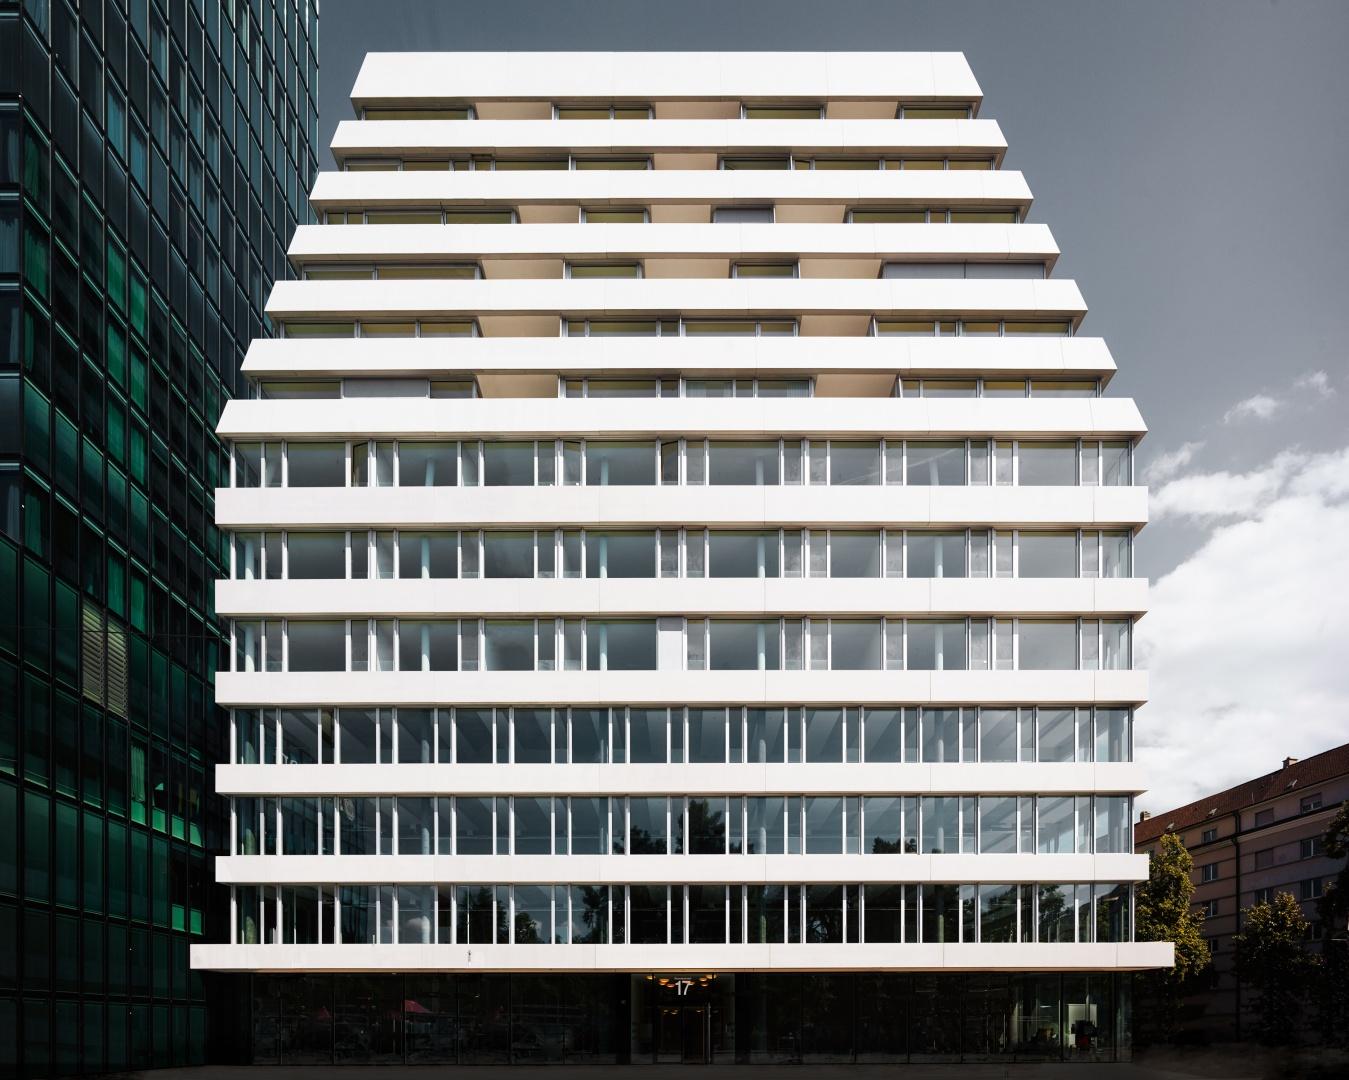 Fassade © Valentin Jeck, Stäfa